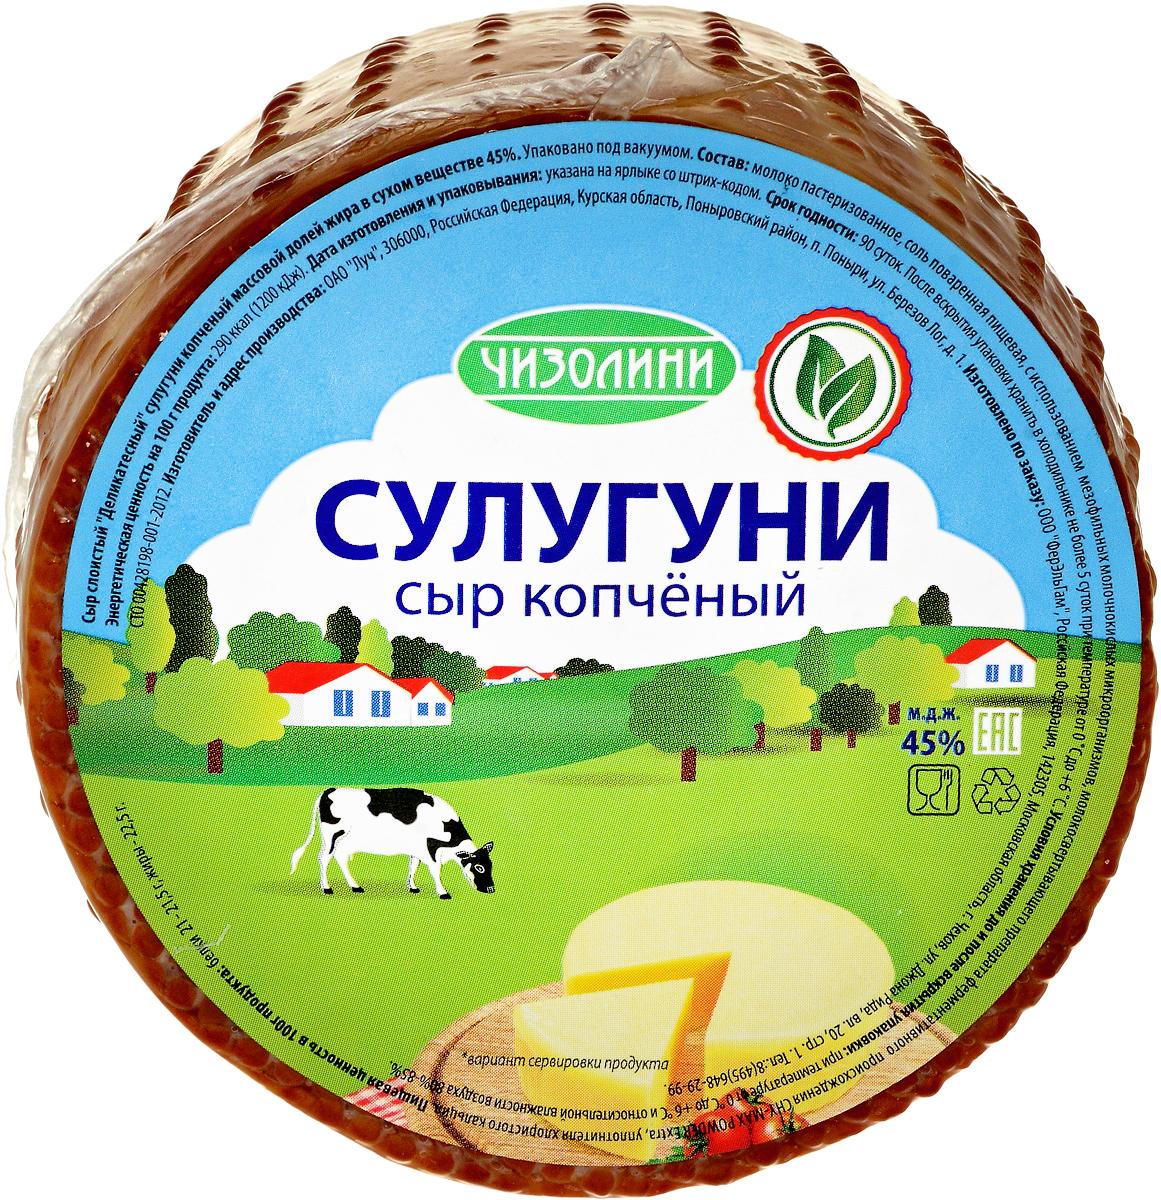 Чизолини Сыр Сулугуни, копченый, 250 г чизолини сыр чечил копченый 150 г